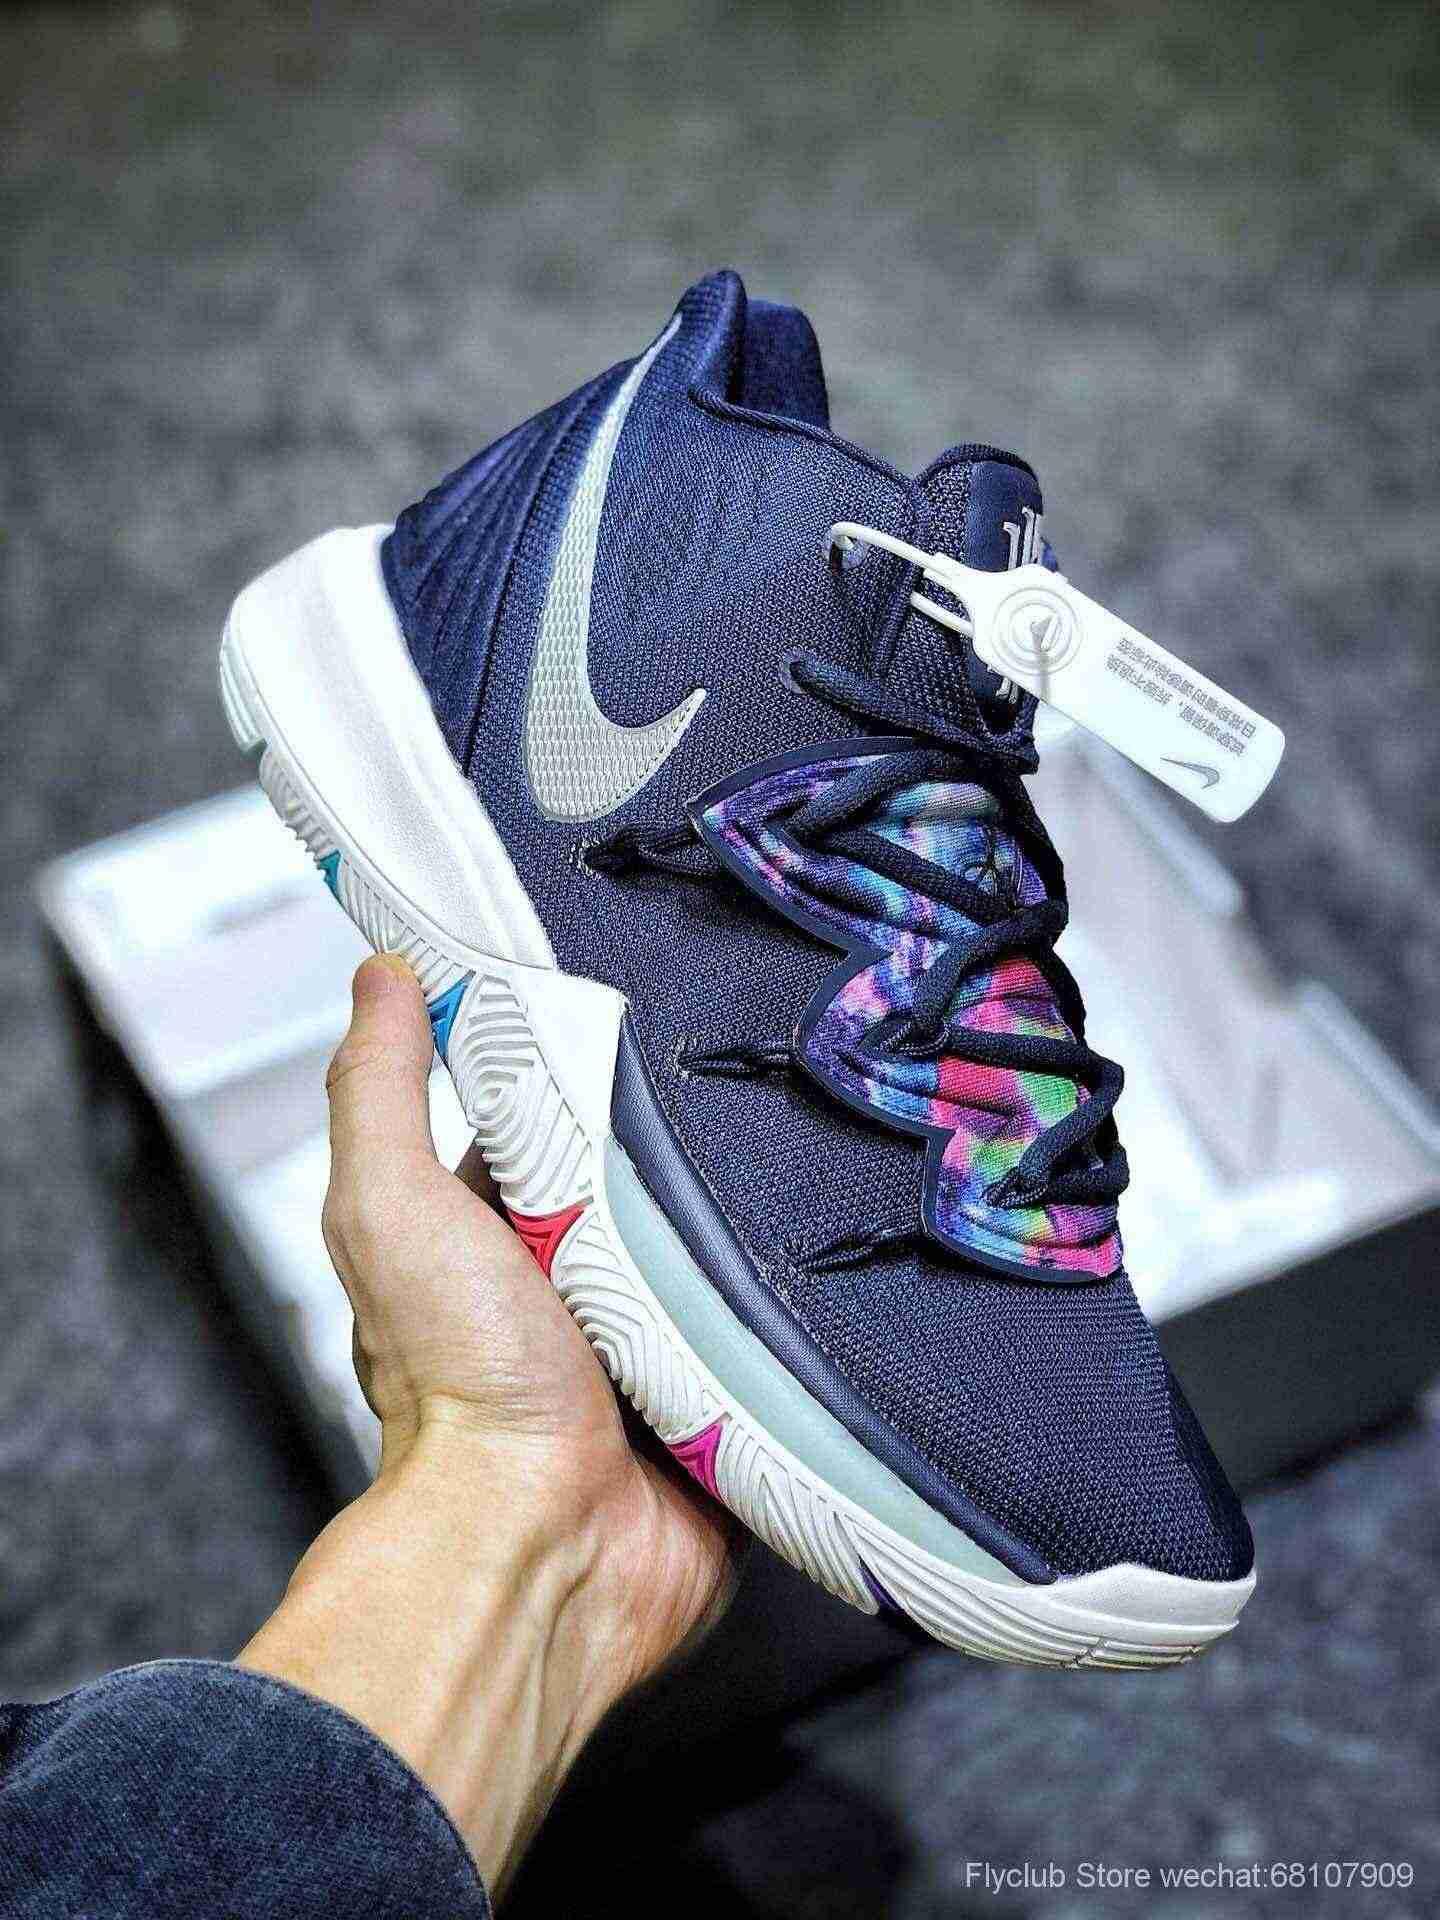 cheap prices cheap prices on wholesale 纯原Nike Kyrie 5 欧文5灵魂之眼‼️第一批大几率过验,正确原盒 ...